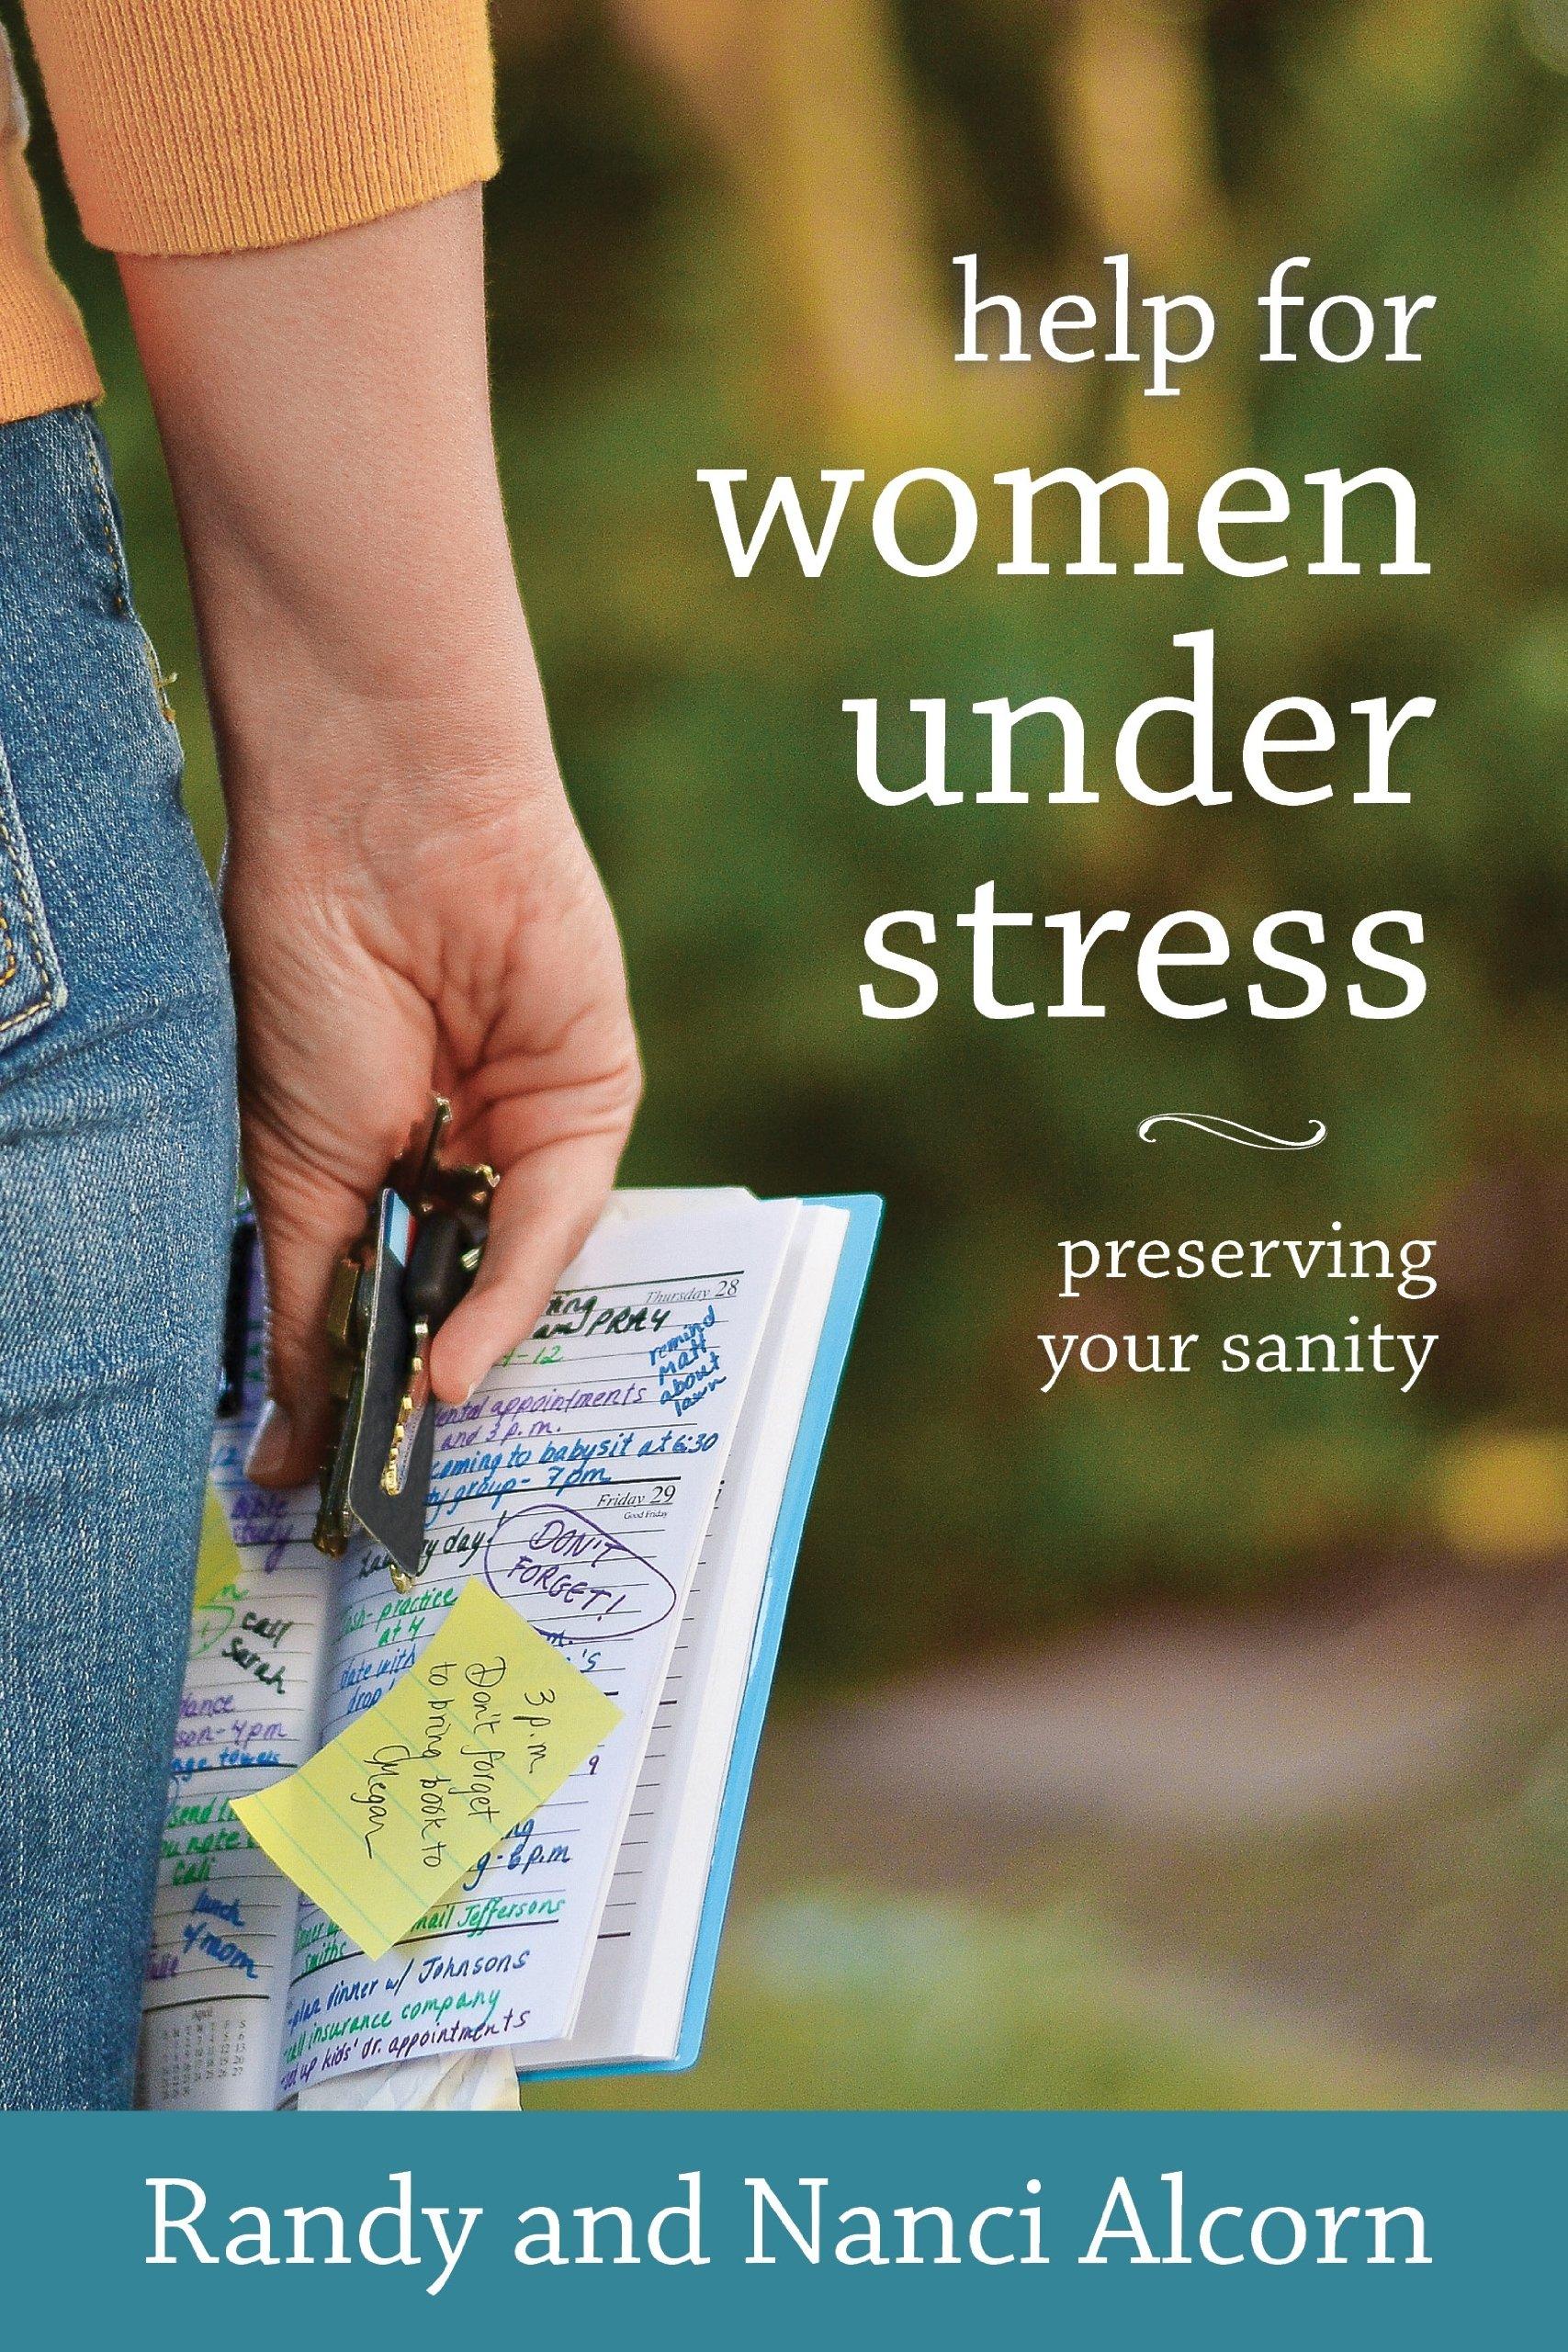 Help for Women Under Stress: Preserving Your Sanity: Randy Alcorn, Nanci  Alcorn: 9780970001610: Amazon.com: Books